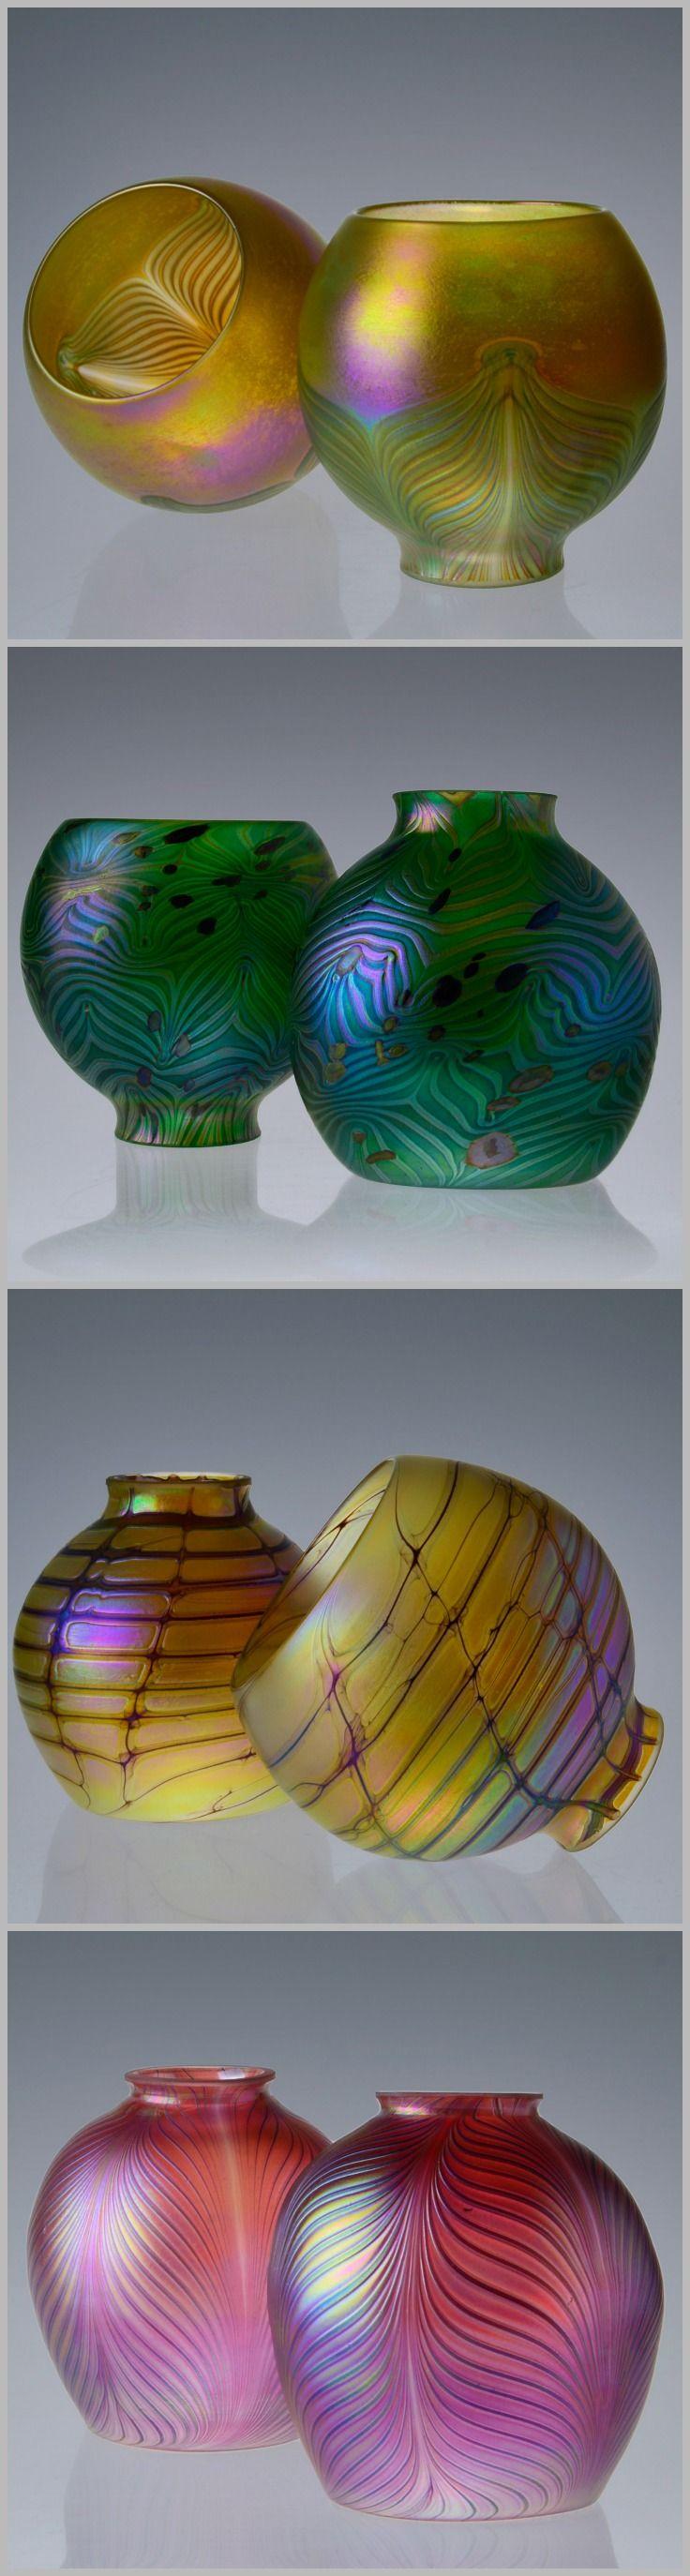 Hand Blown Glass Lamp Shade | Replacement Glass Shade 2.25'' Fitter | Art Nouveau Shades | Bohemian Lamp Shade https://www.etsy.com/shop/IricapeGlass